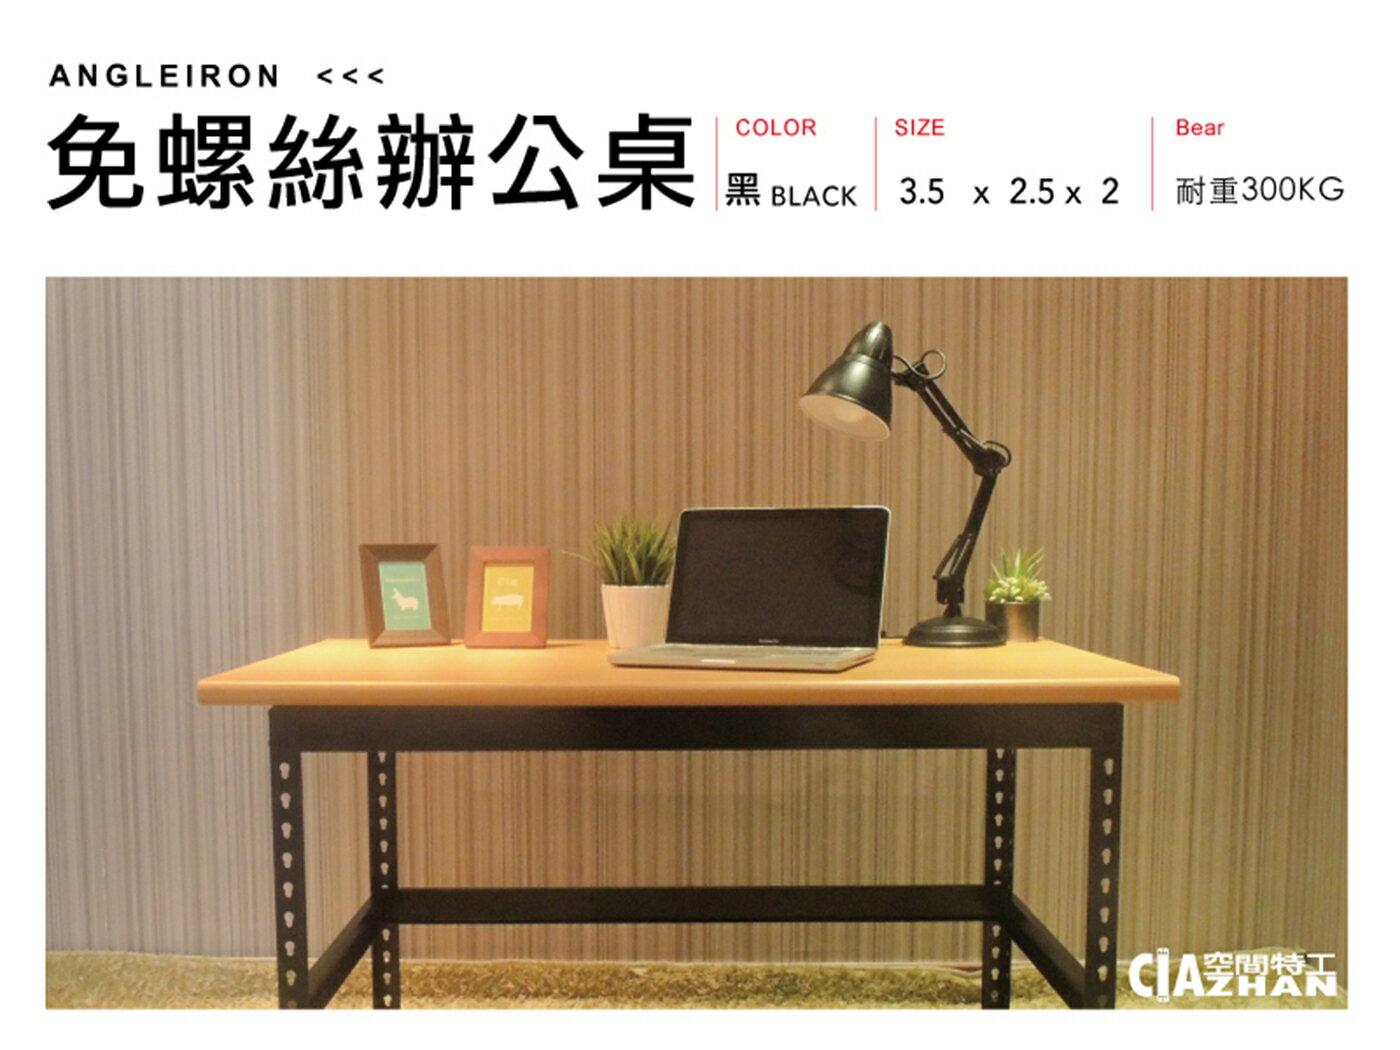 OA辦公桌♞空間特工♞(木紋桌板120x45cm,高密度塑合板 抗刮耐磨)消光黑角鋼 電腦桌 工作桌 會議桌 免運費 - 限時優惠好康折扣